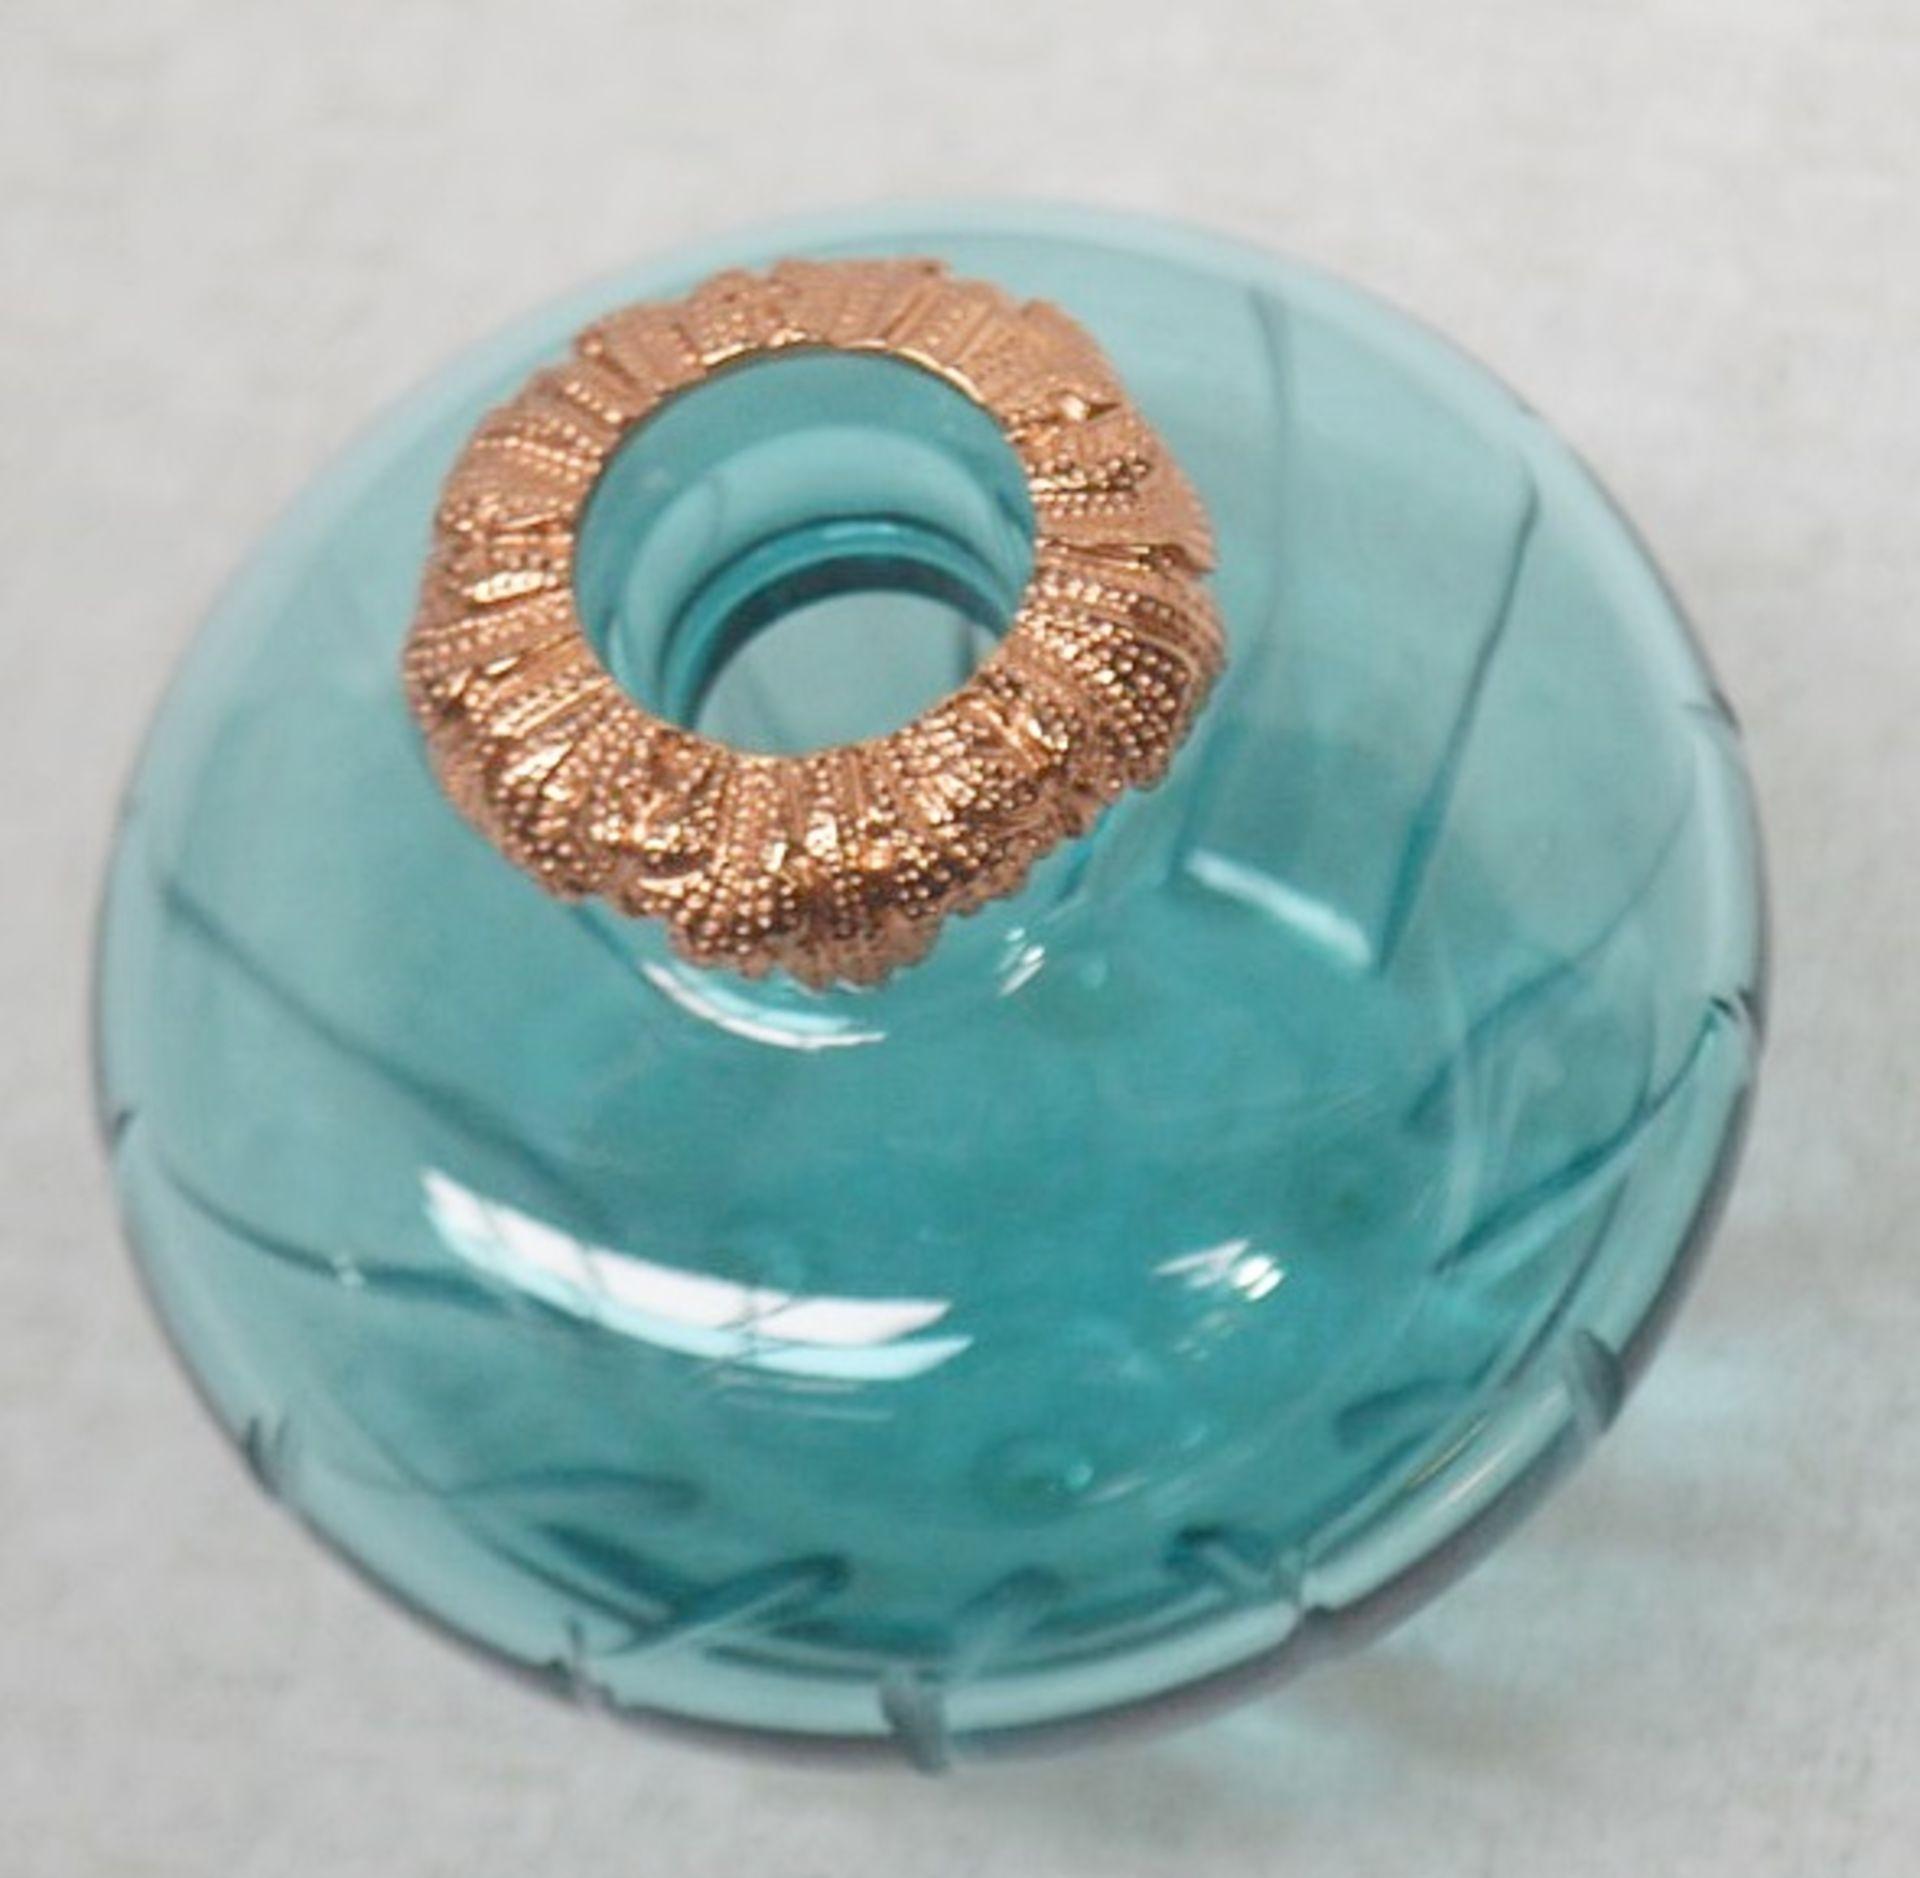 1 x BALDI 'Home Jewels' Italian Hand-crafted Artisan Ottanio Crystal Perfume Bottle & Stick - - Image 6 of 6